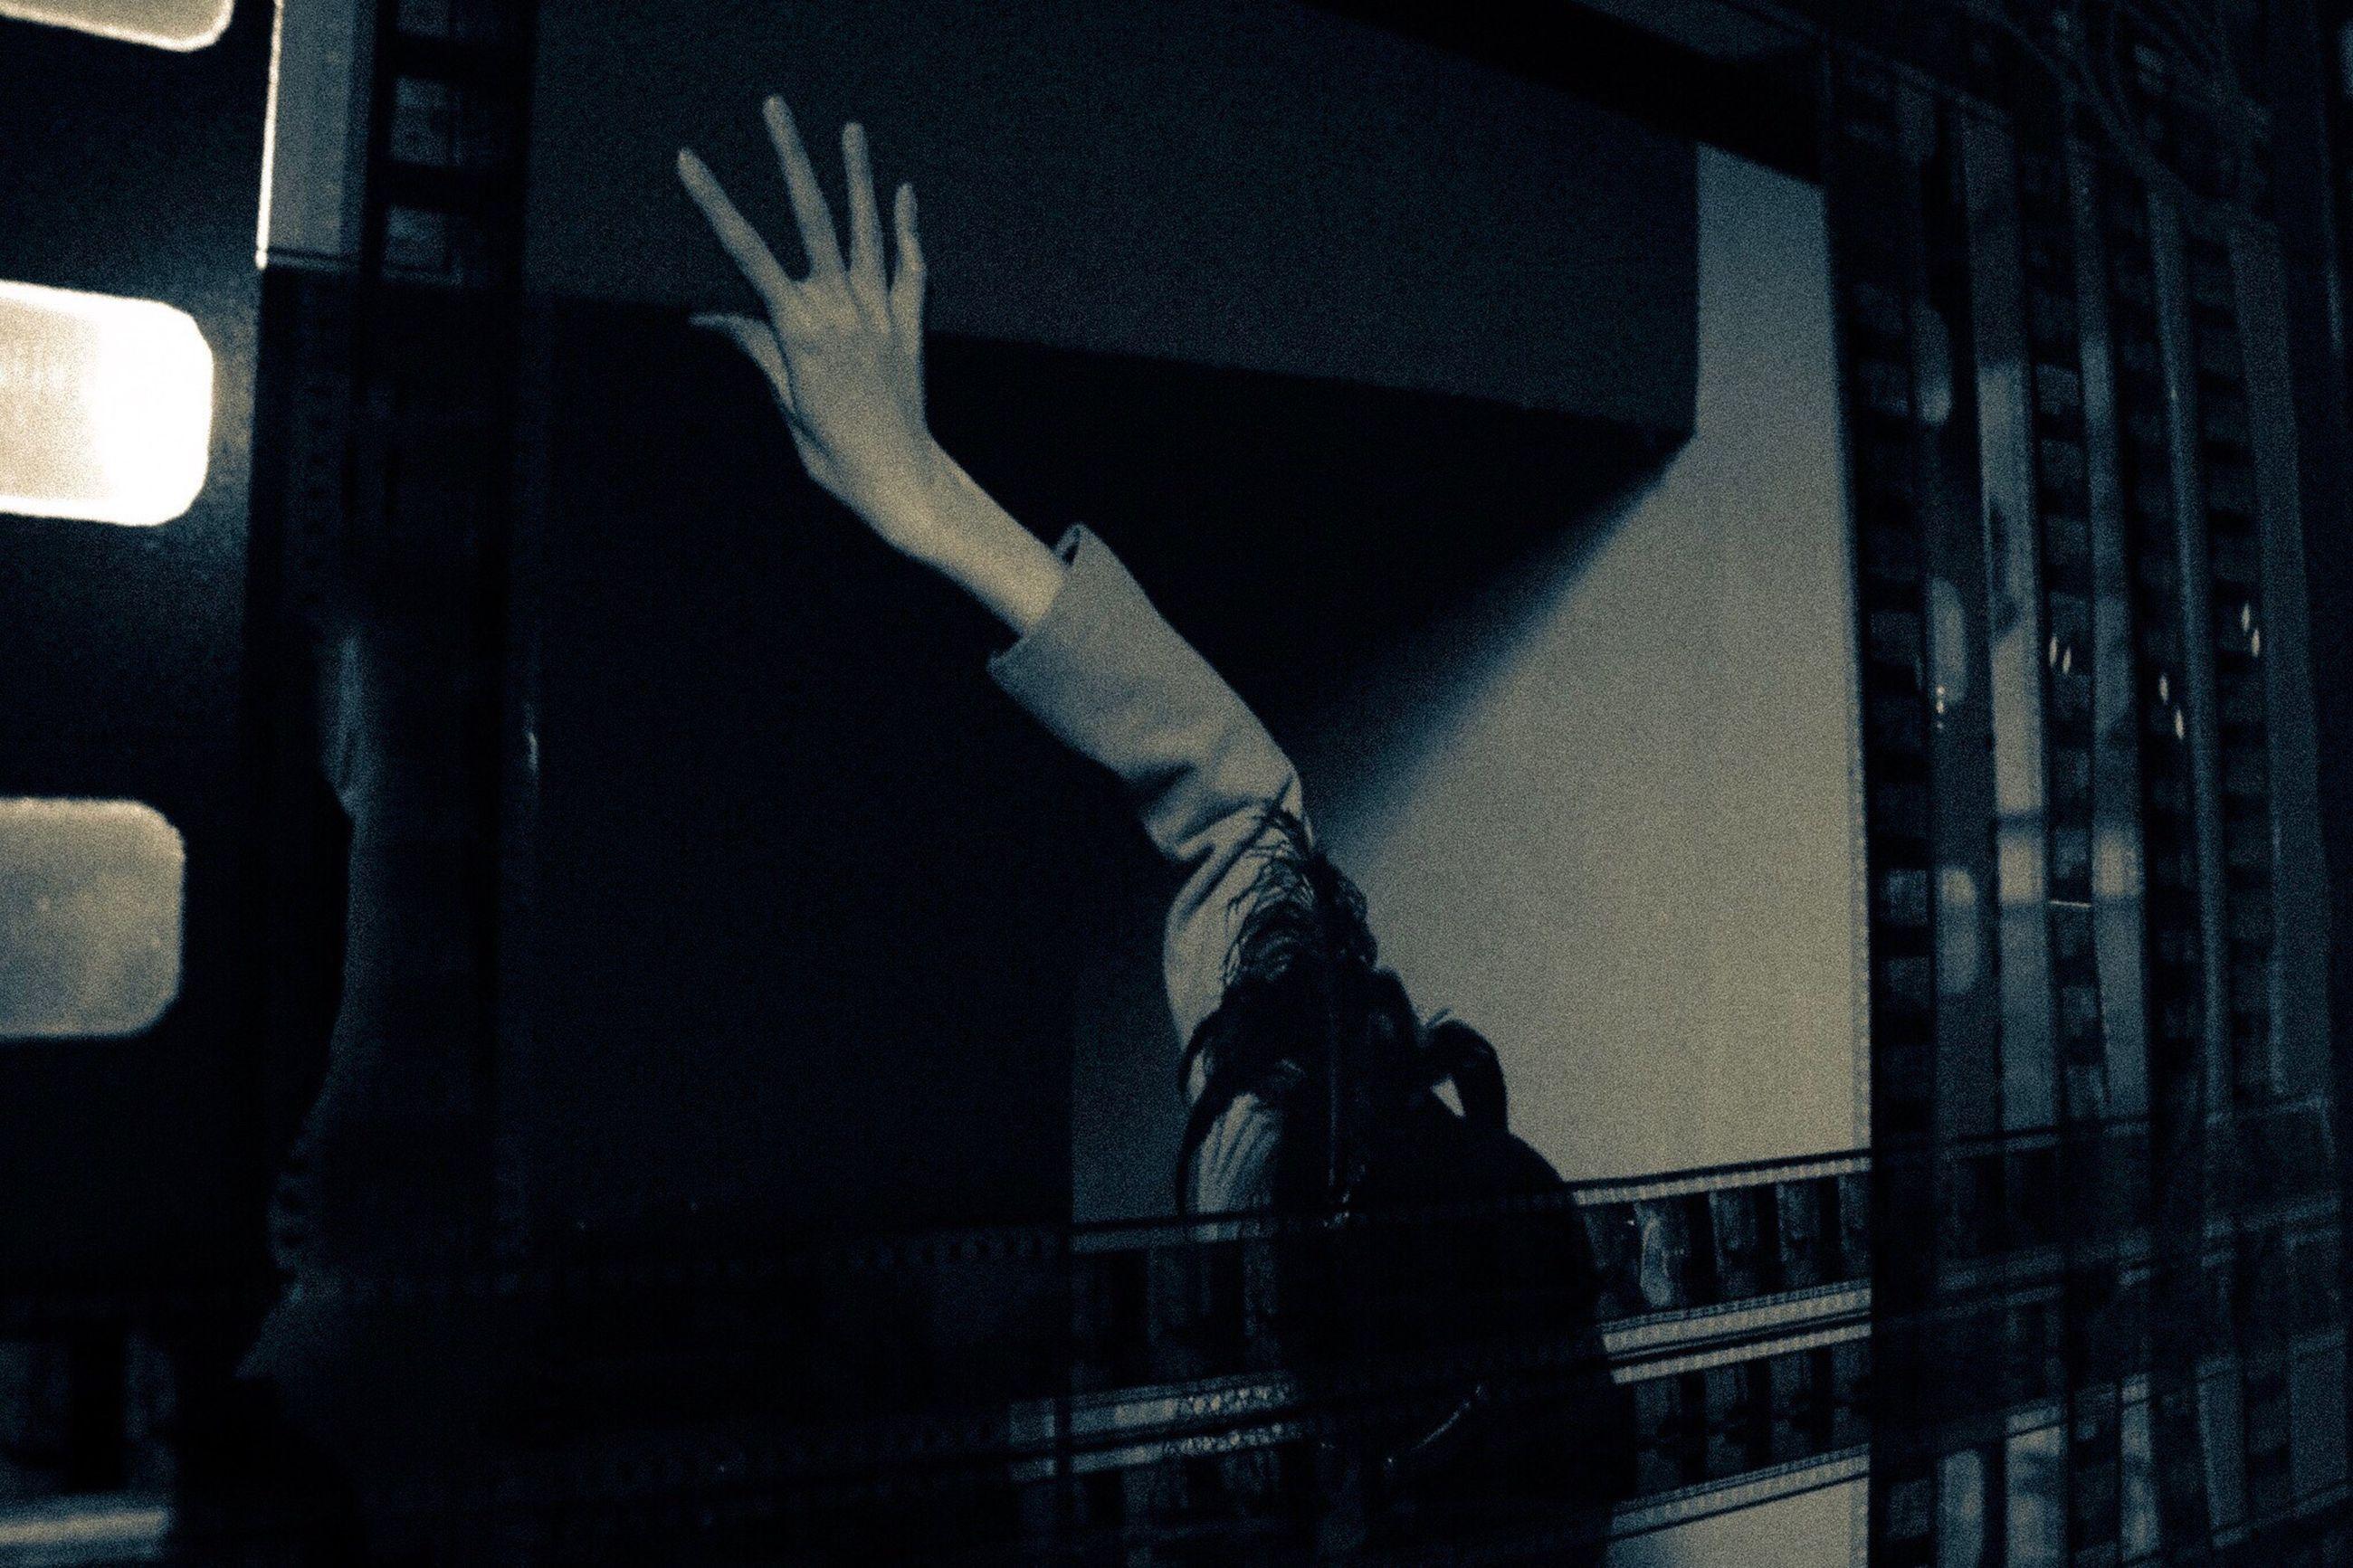 indoors, night, men, one person, human body part, illuminated, people, human hand